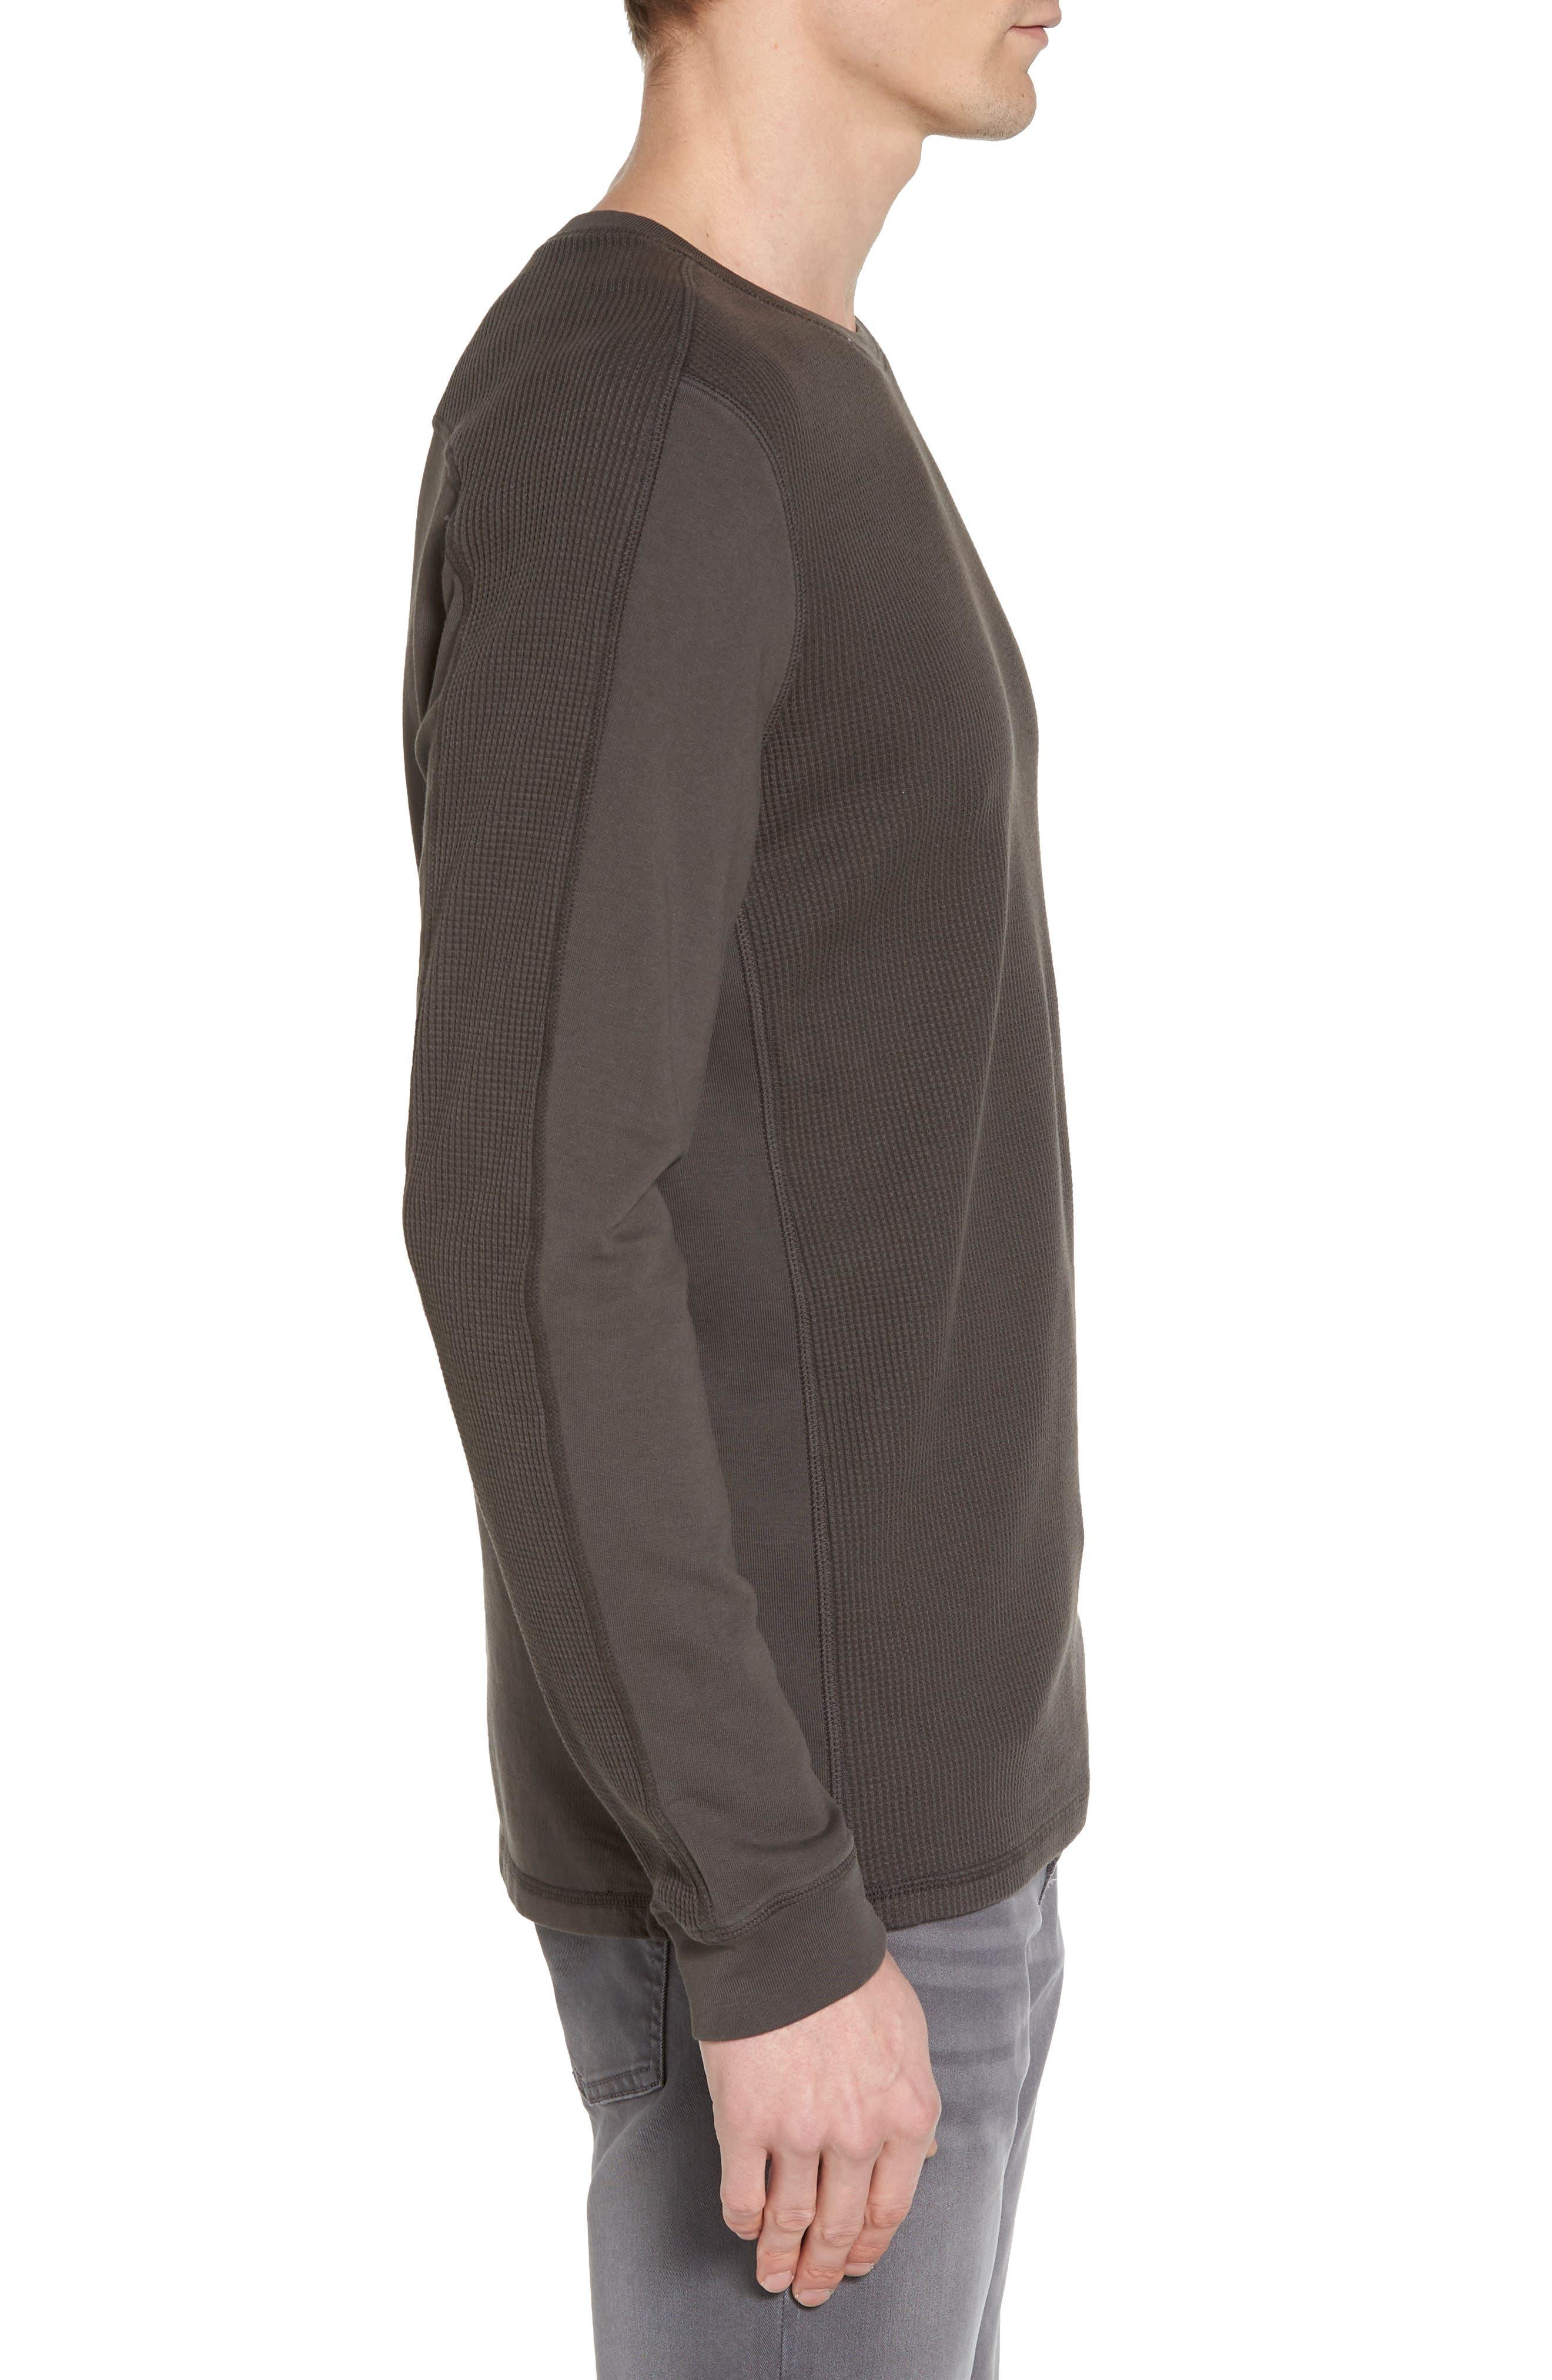 Trevor Slim Fit Crewneck Shirt,                             Alternate thumbnail 3, color,                             Smoke Grey